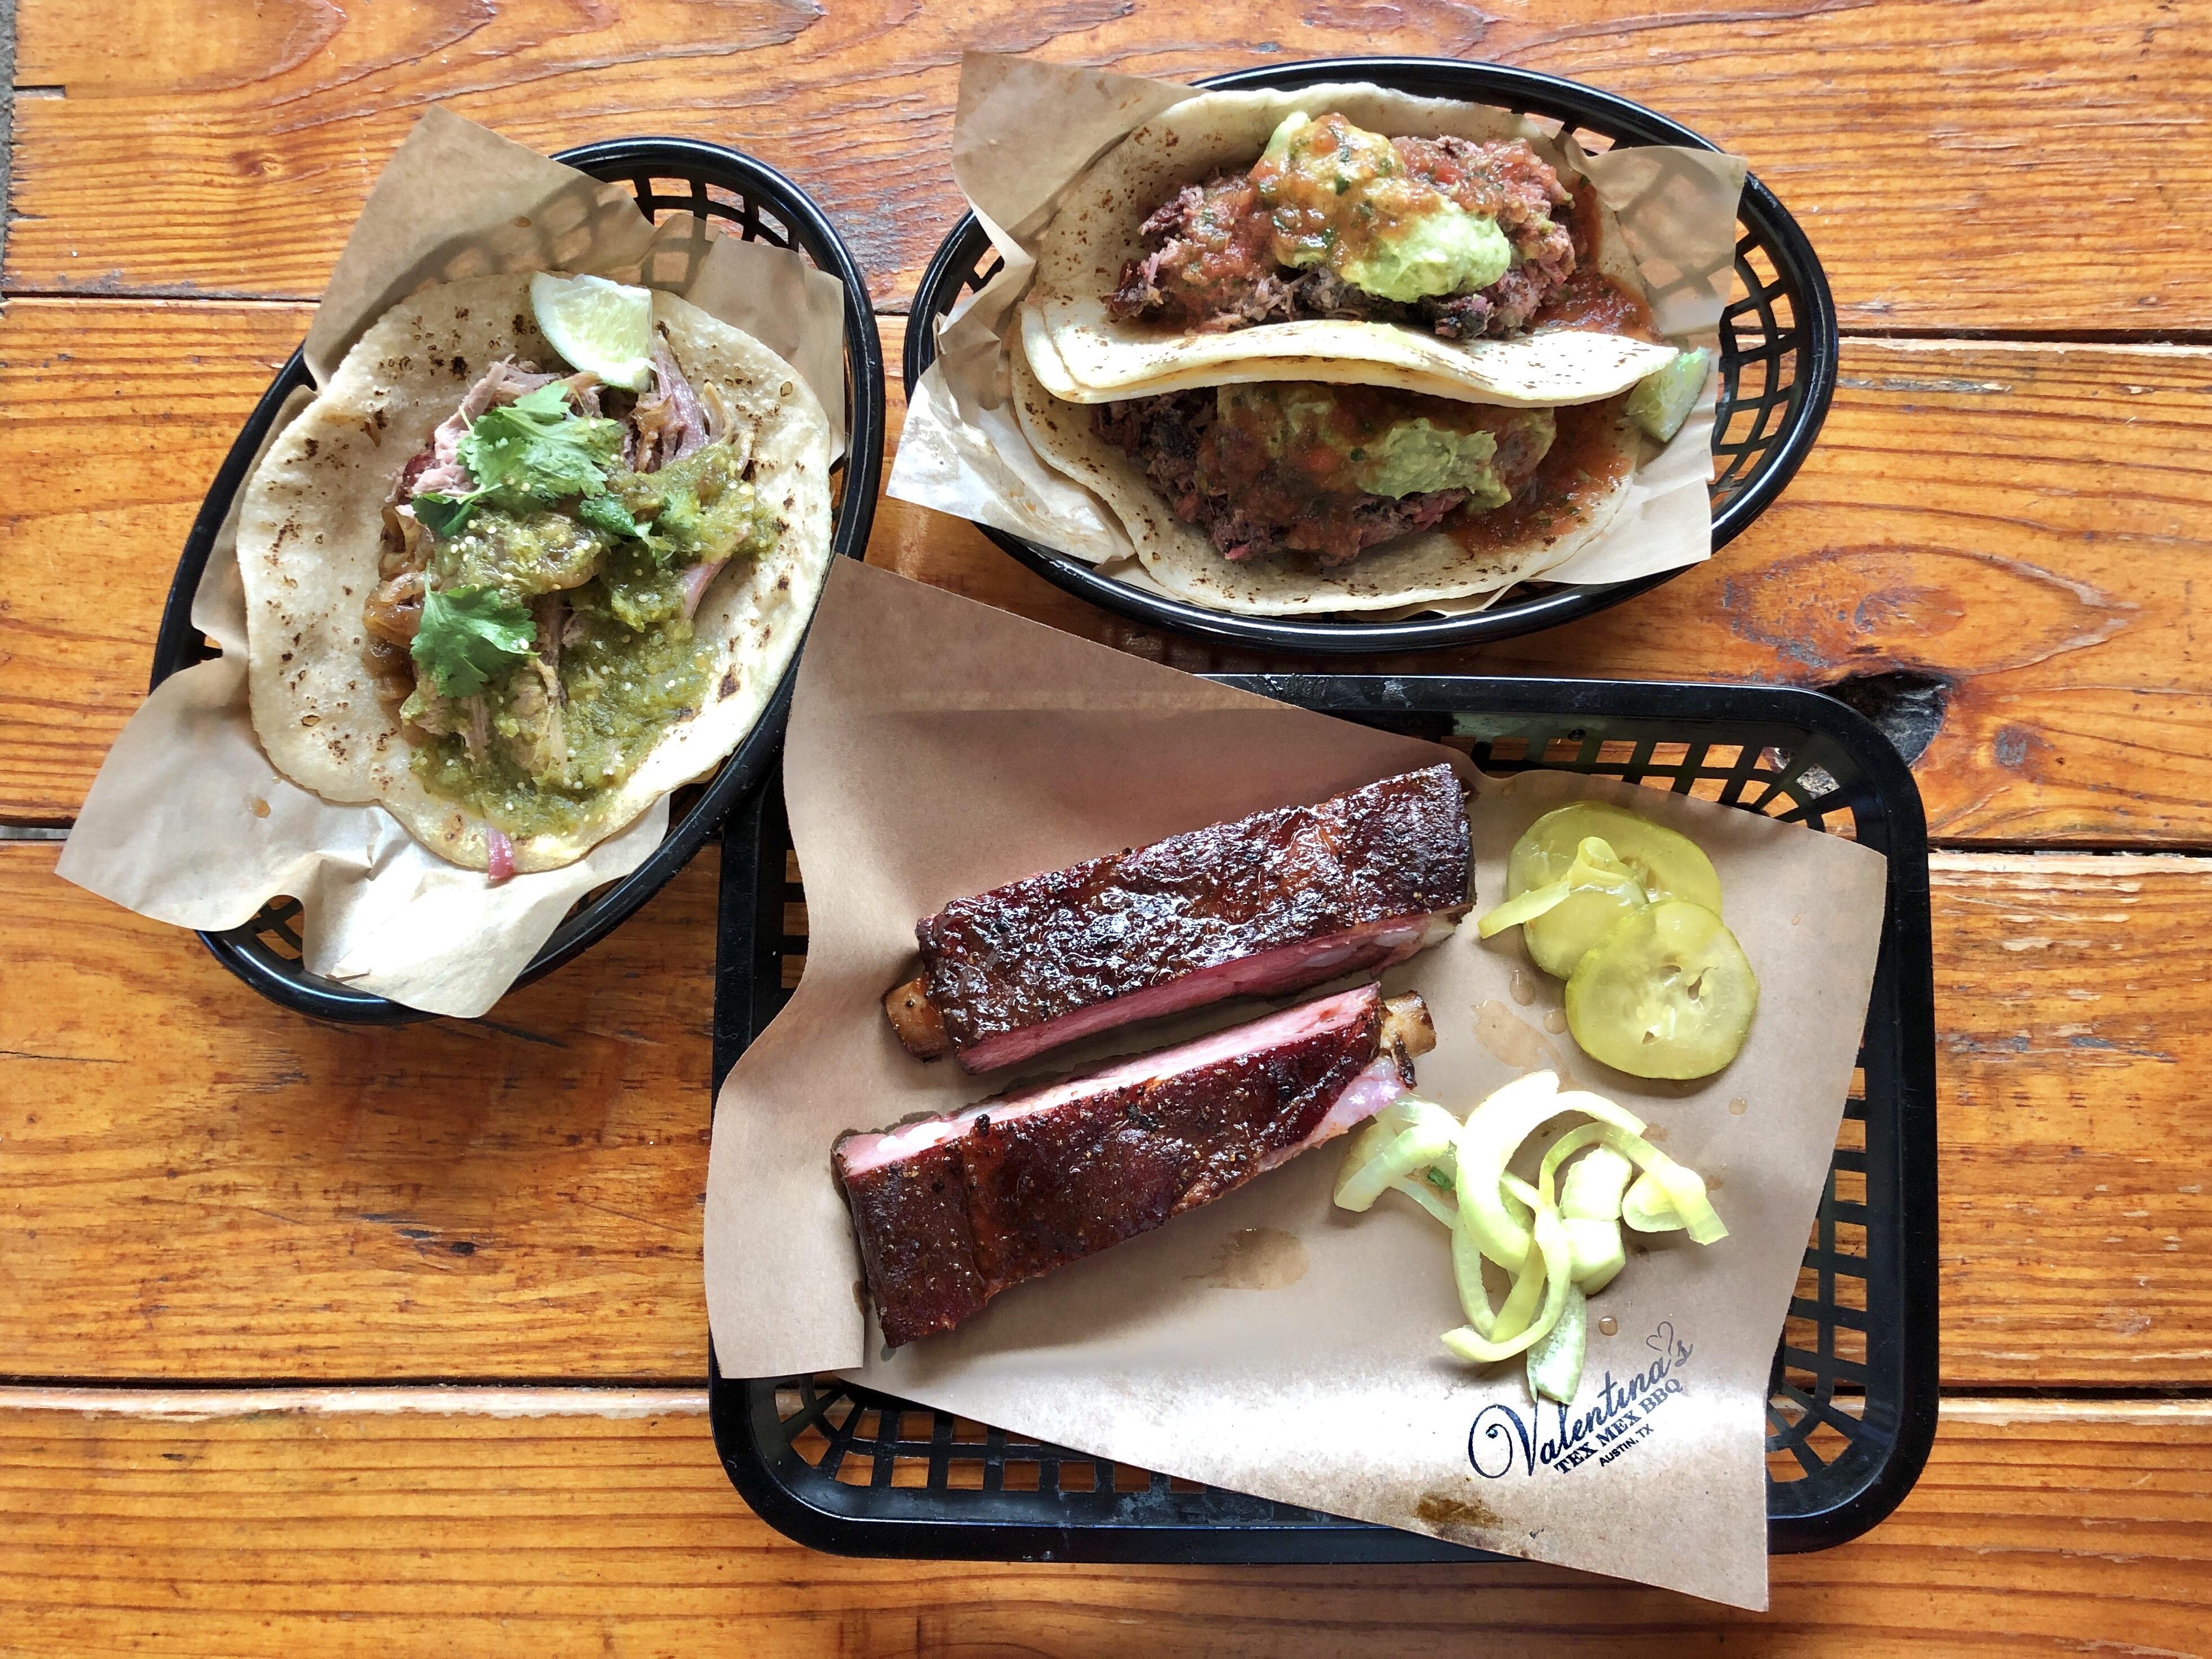 Lunch at Valentina's Tex-Mex BBQ in Austin, Texas